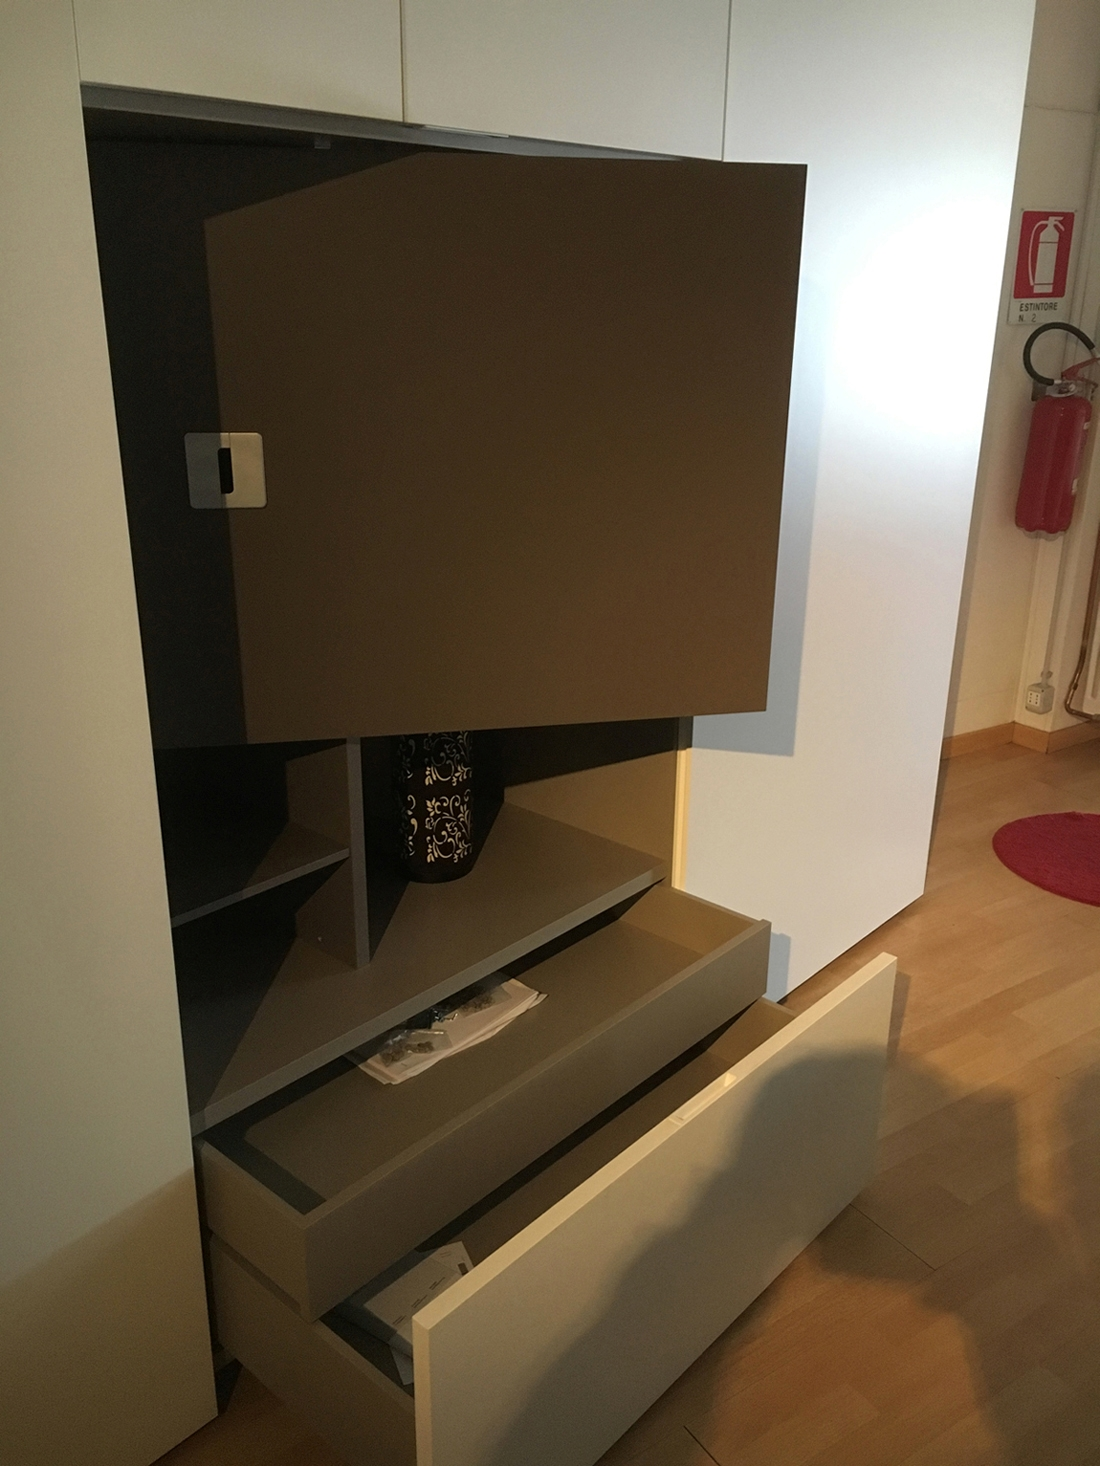 Caccaro Armadio Mod. flat Moderno Laccato Opaco Ante ...